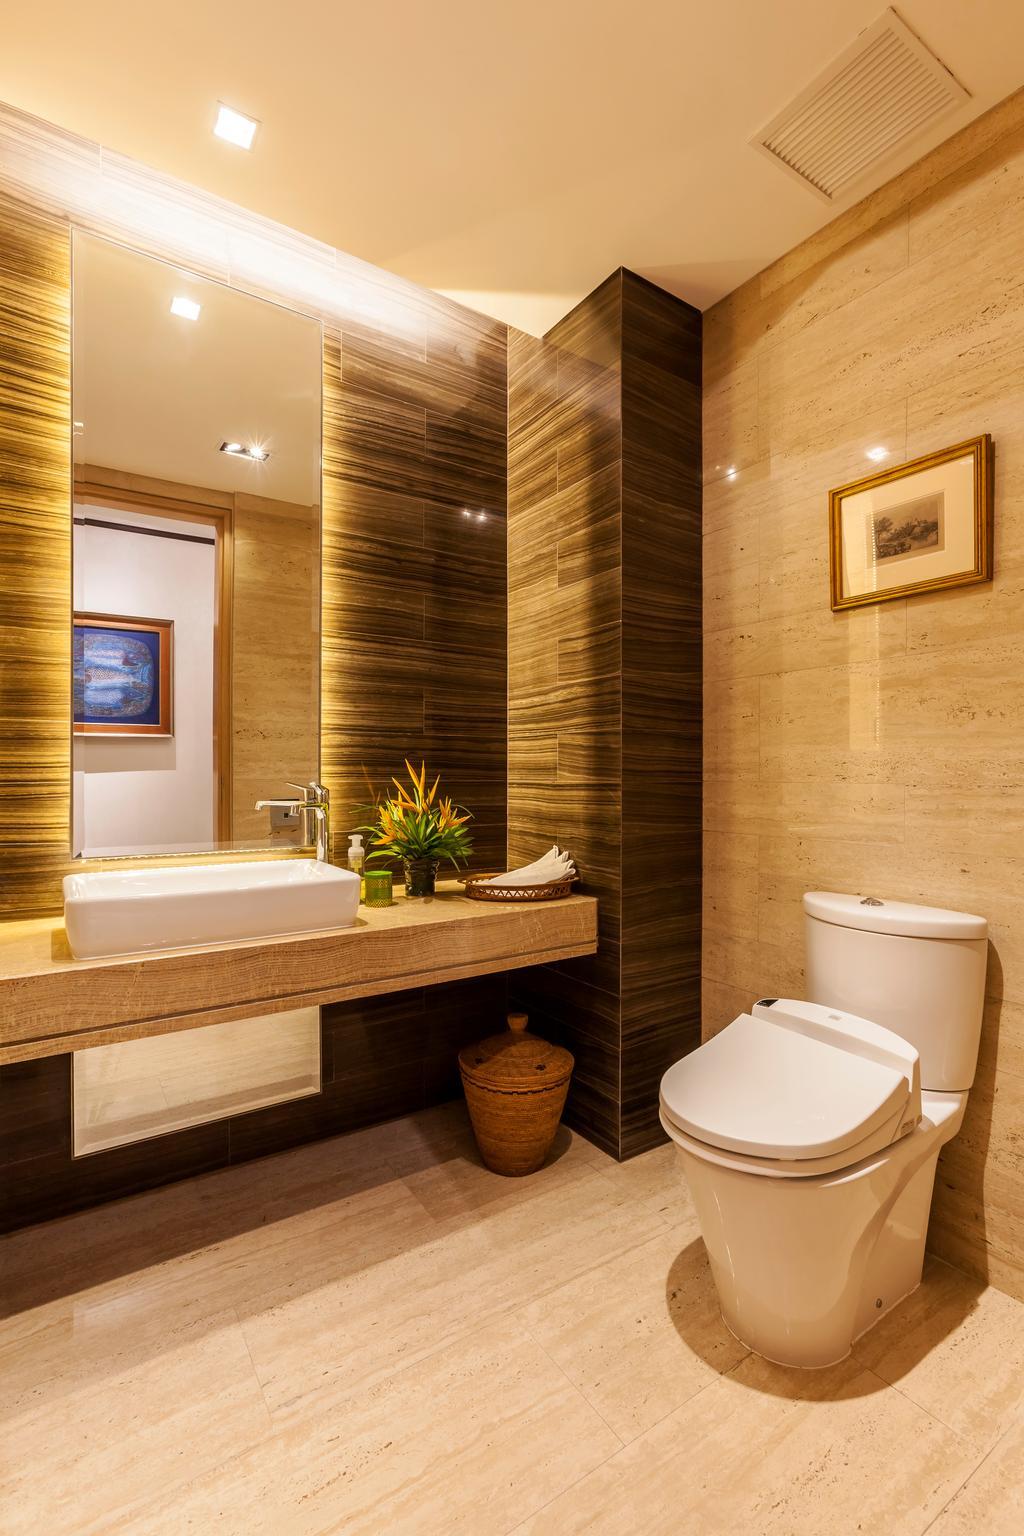 Traditional, Condo, Bathroom, River Valley, Interior Designer, Habitat One, Contemporary, Toilet, Flora, Jar, Plant, Potted Plant, Pottery, Vase, Indoors, Interior Design, Molding, Art